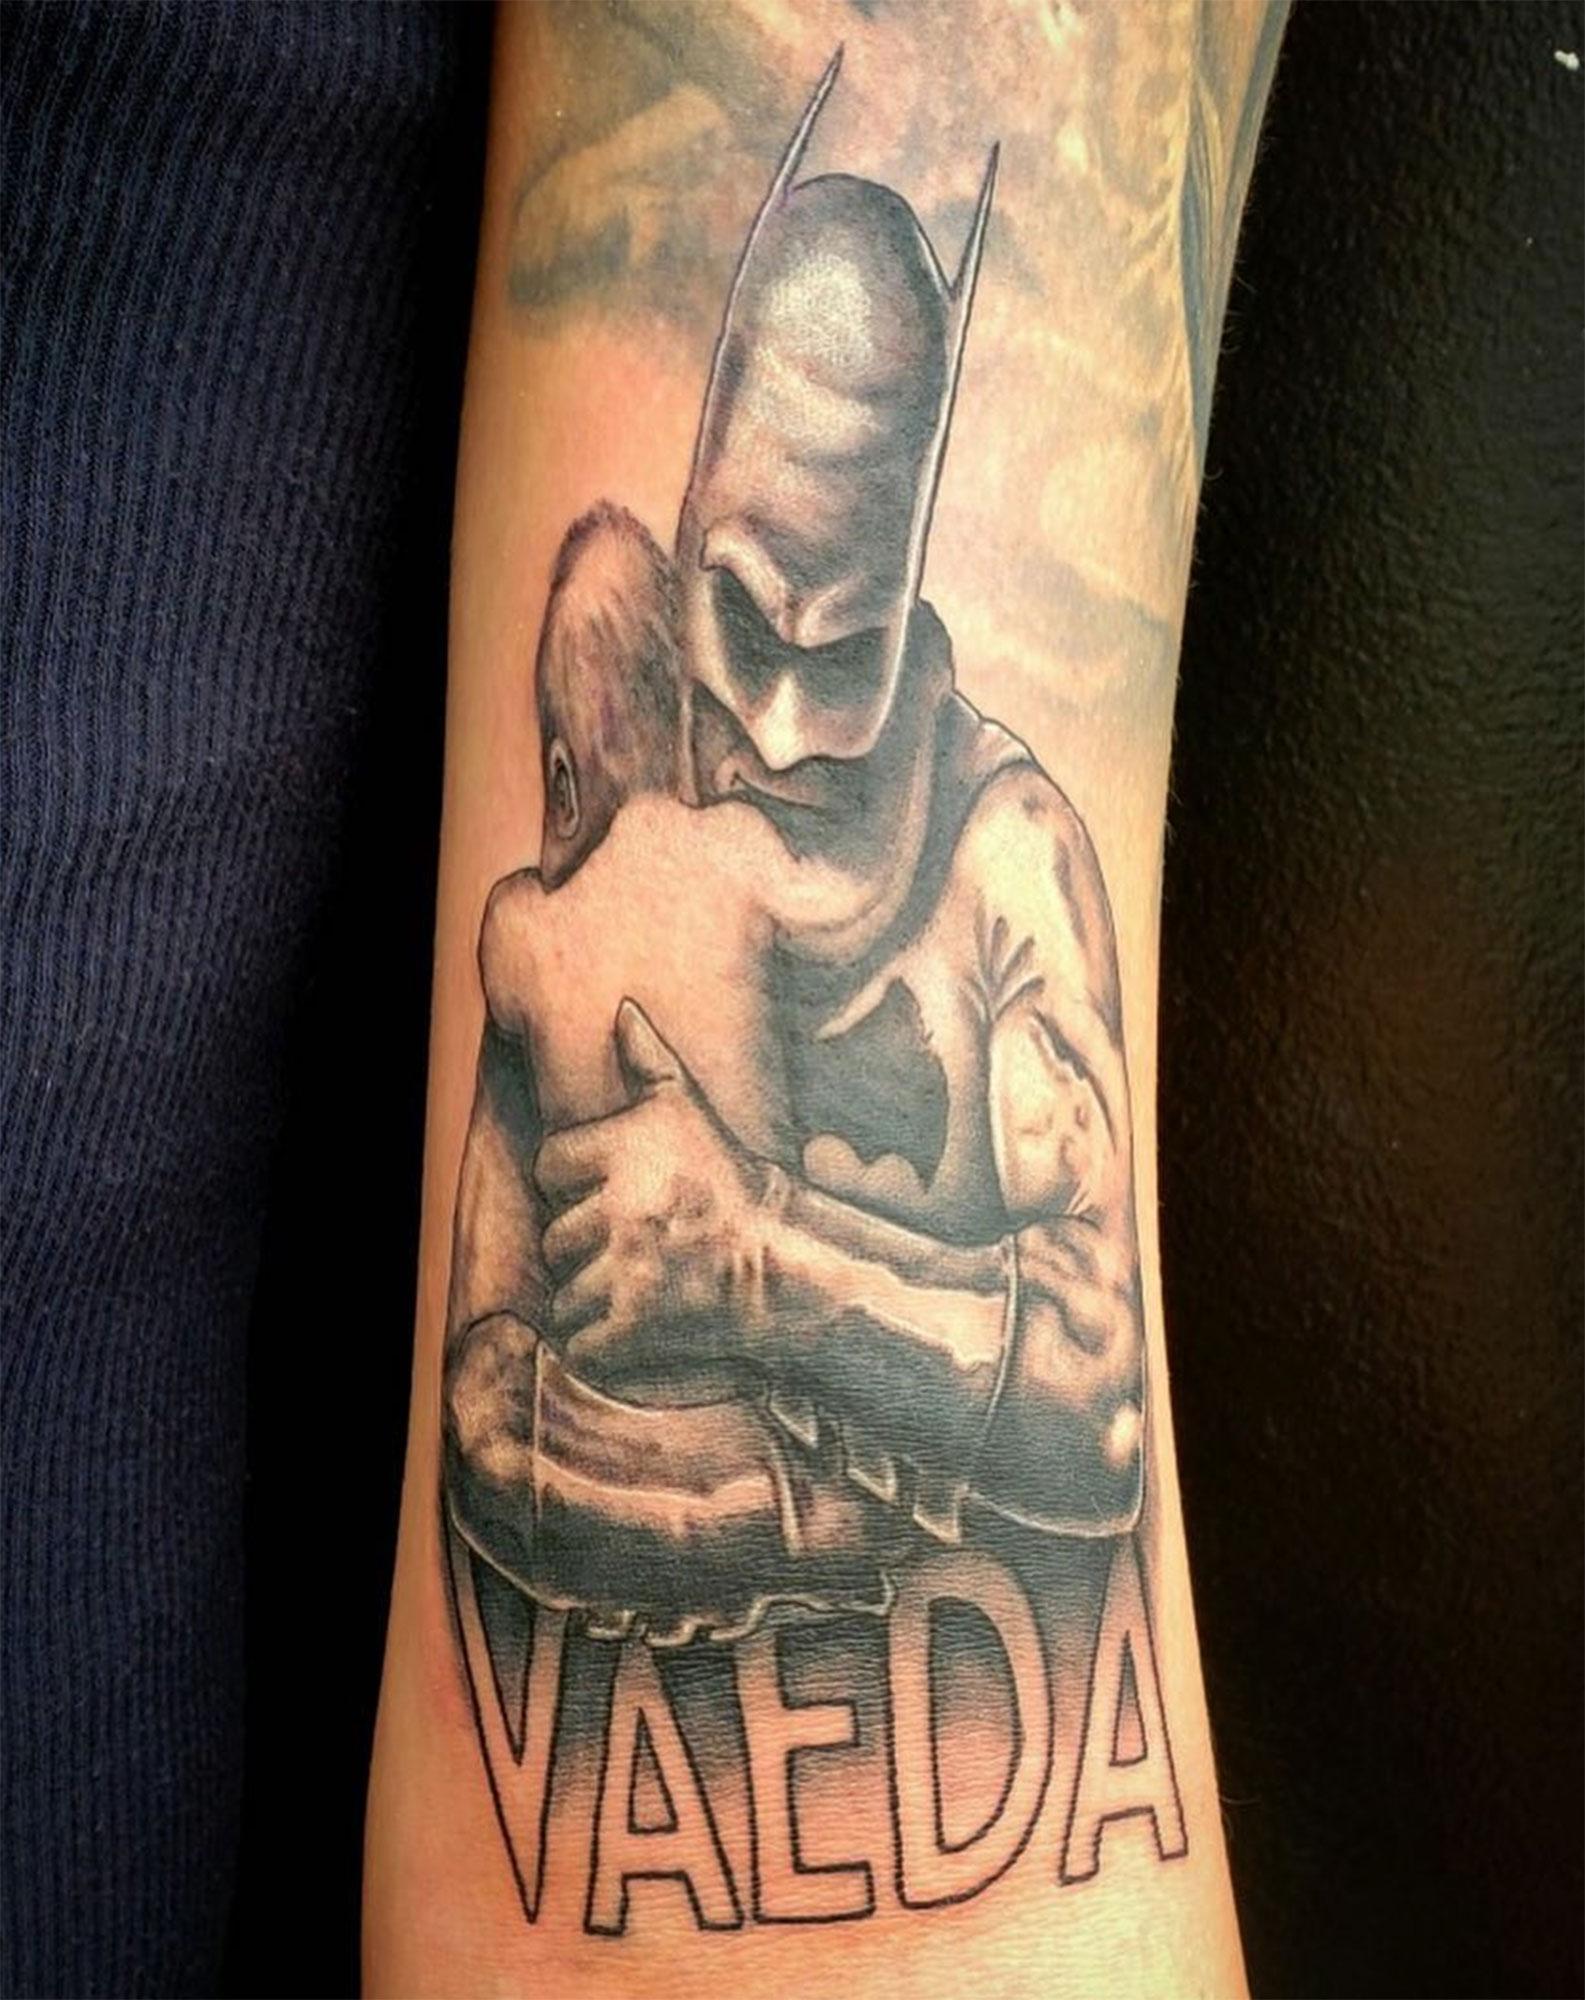 ae0da8e21e0e7 See Celebrities' Craziest Tattoos - Us Weekly